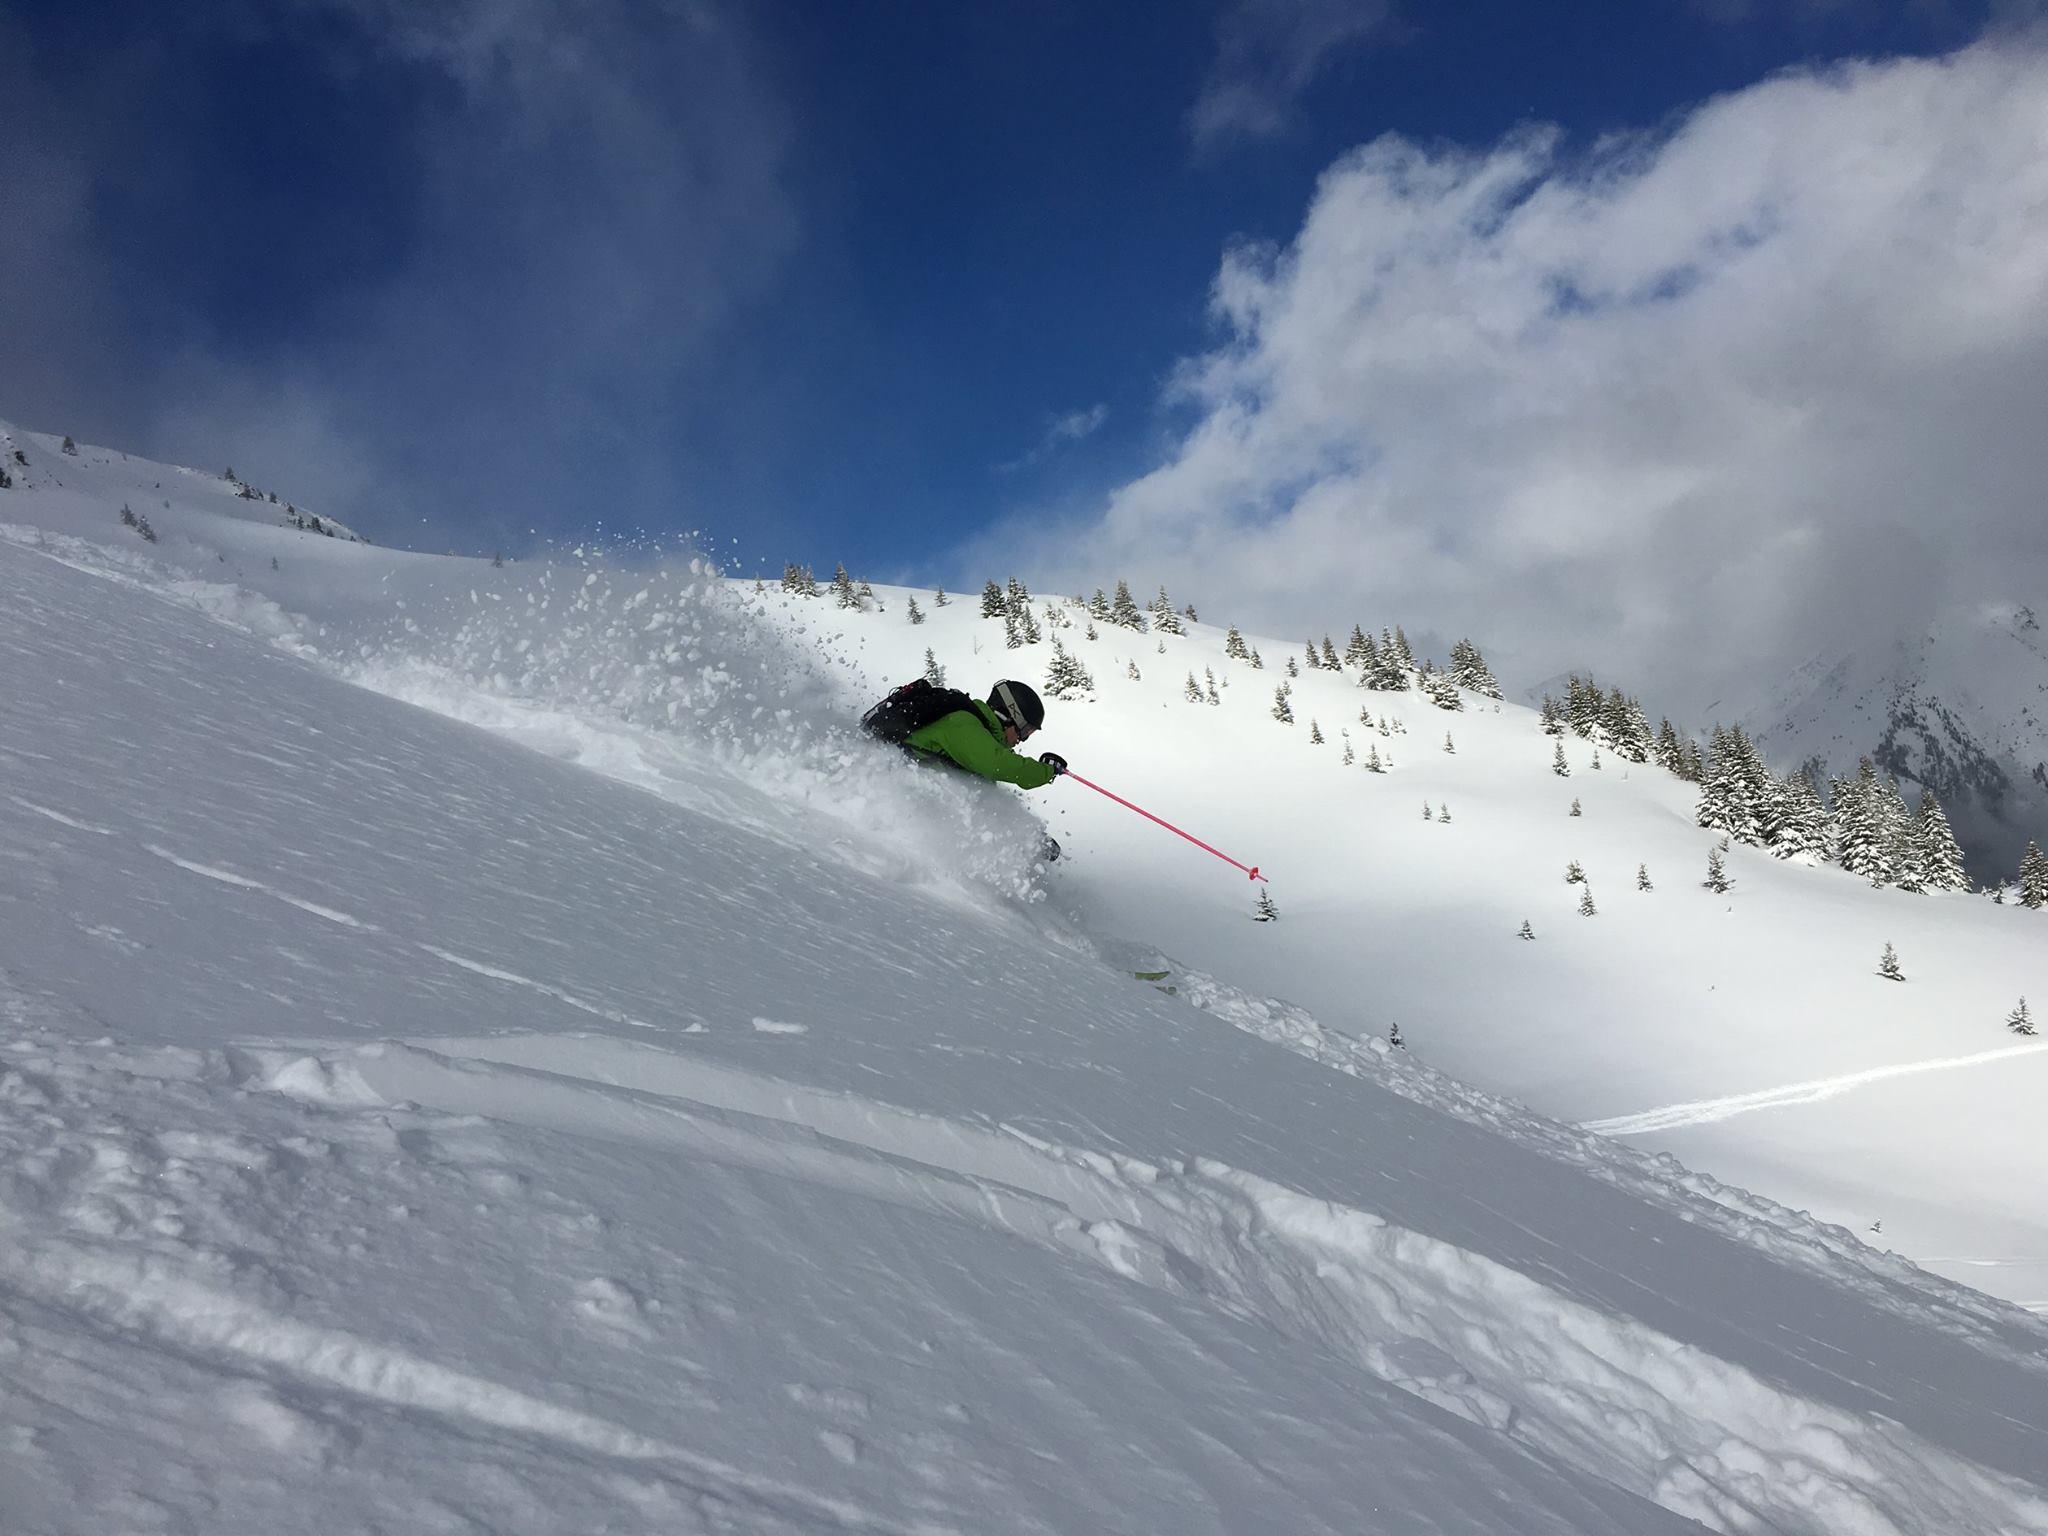 49 inches in Chamonix = faceshots all round | facebook.com/ChamonixFans